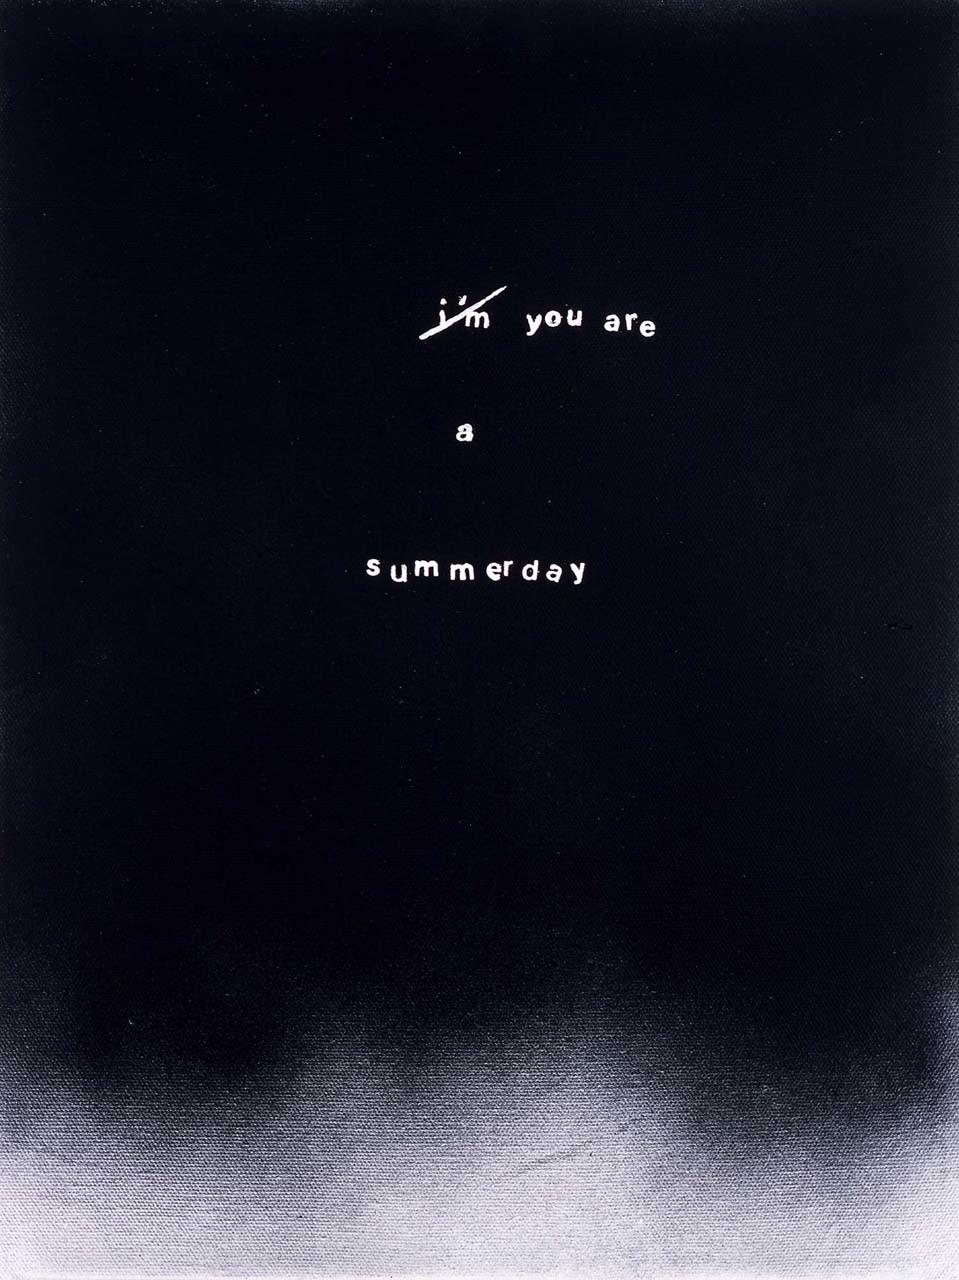 "<div class=""artwork_caption""><p>lines out to silence, 2005</p></div>"